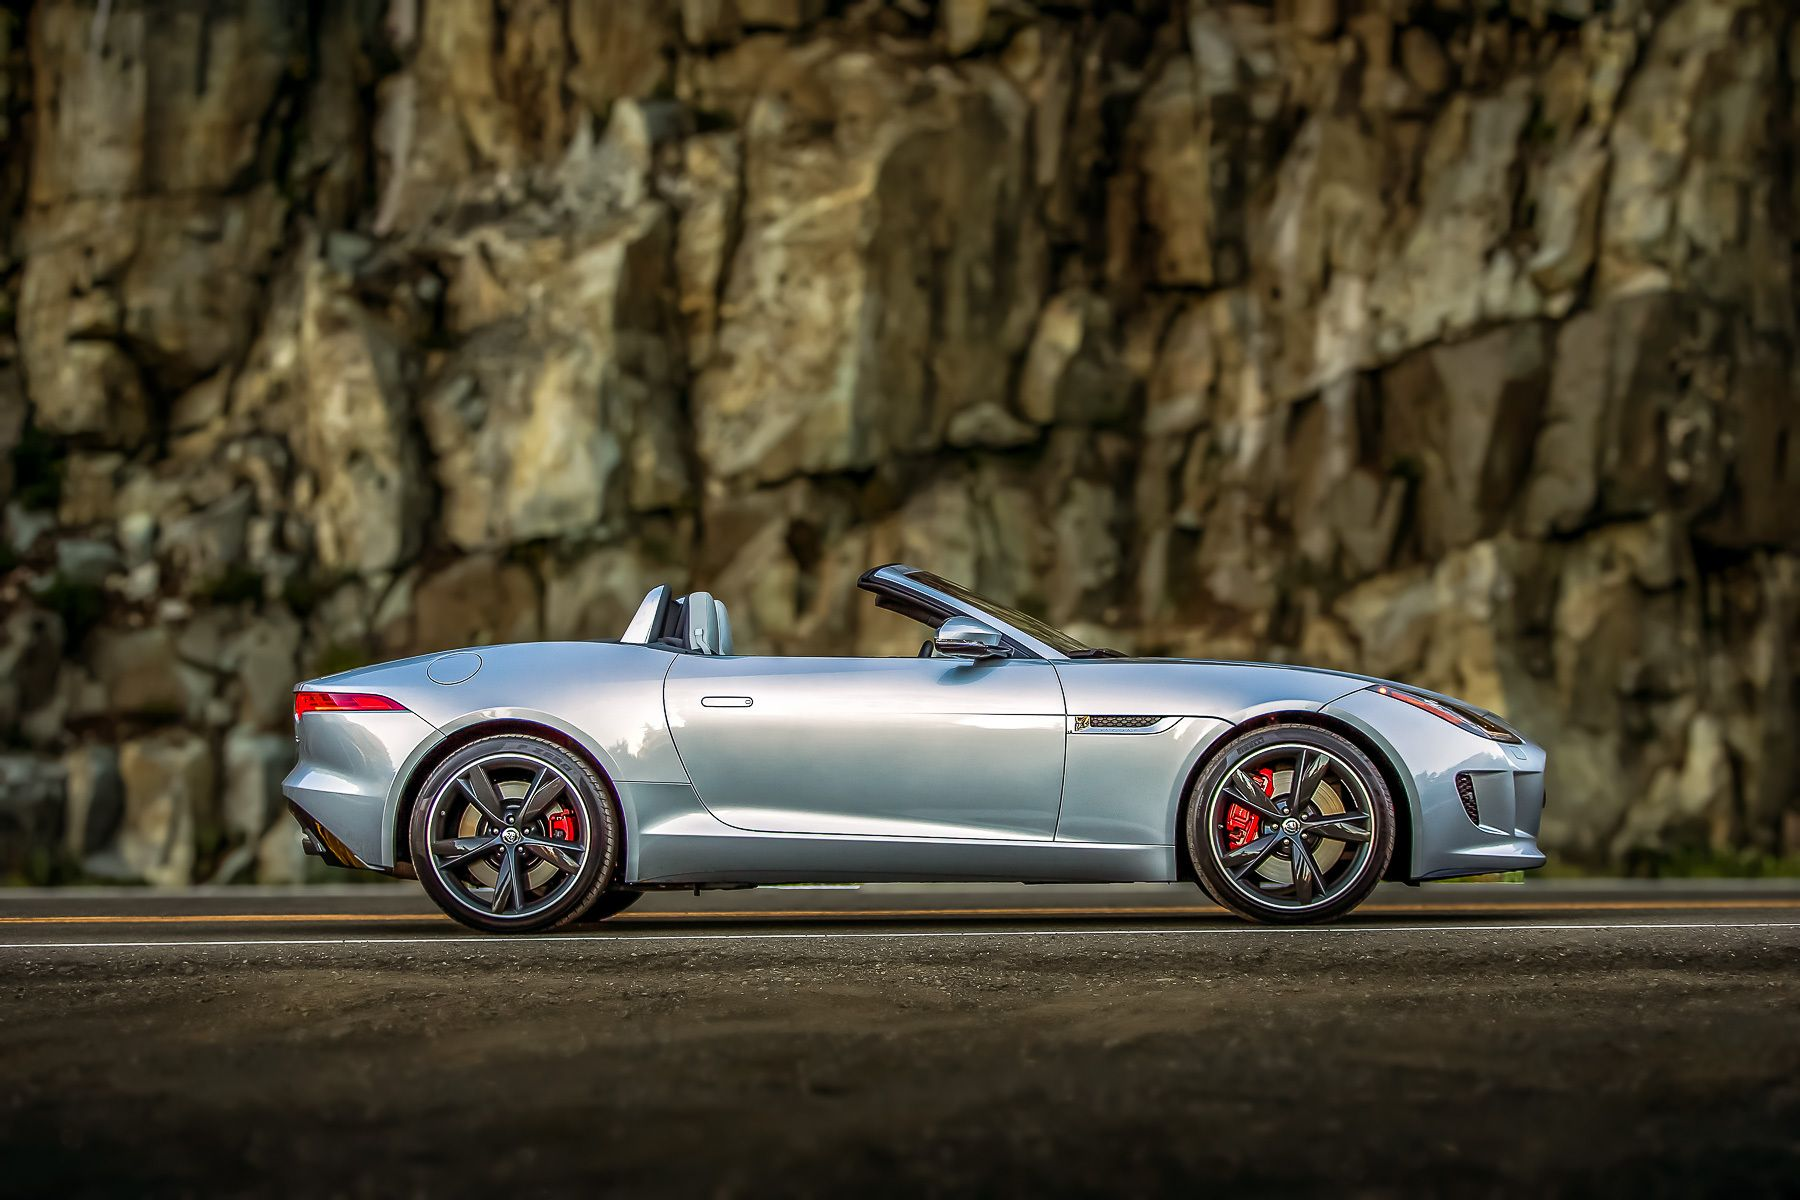 Jaguar F-Type, Mt. Ranier